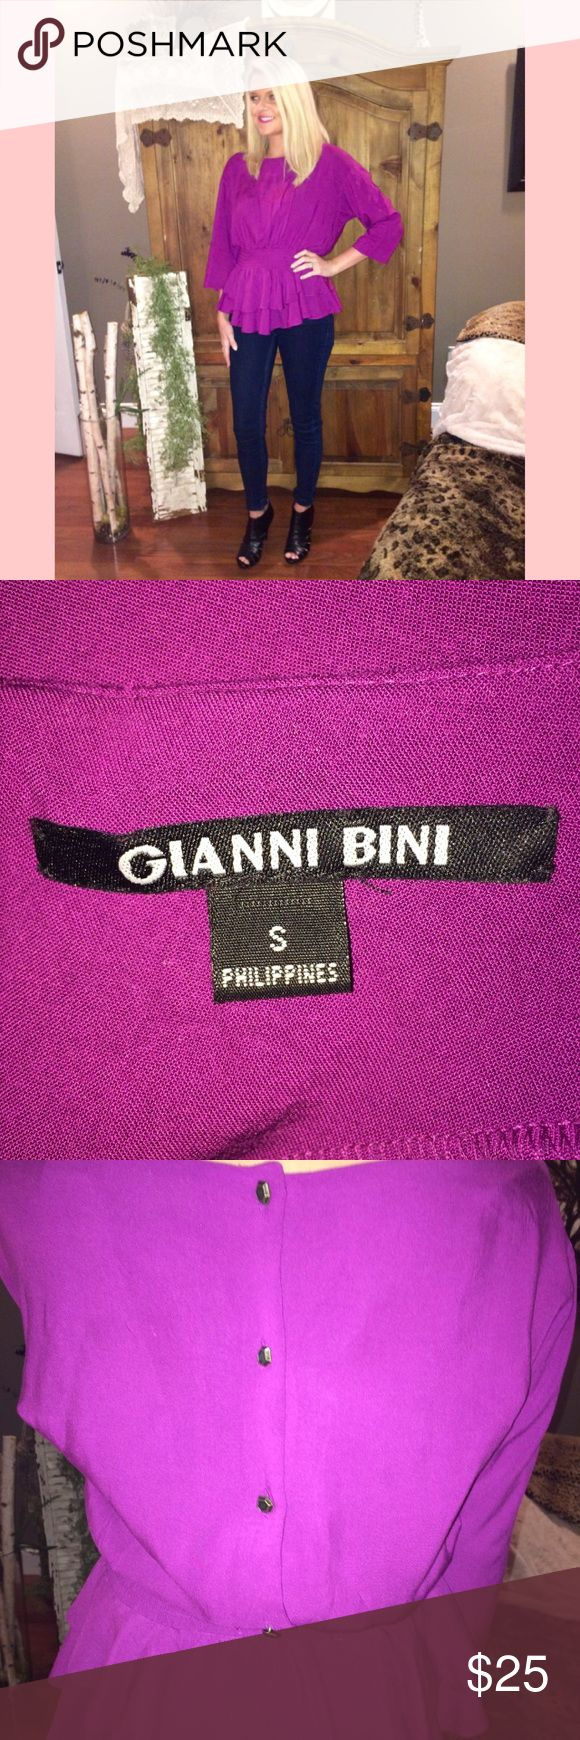 Gianni Bini fuchsia blouse • small • super chic✨ Gianni Bini fuchsia blouse • small • super chic✨  • no trades • offers welcome Gianni Bini Tops Blouses